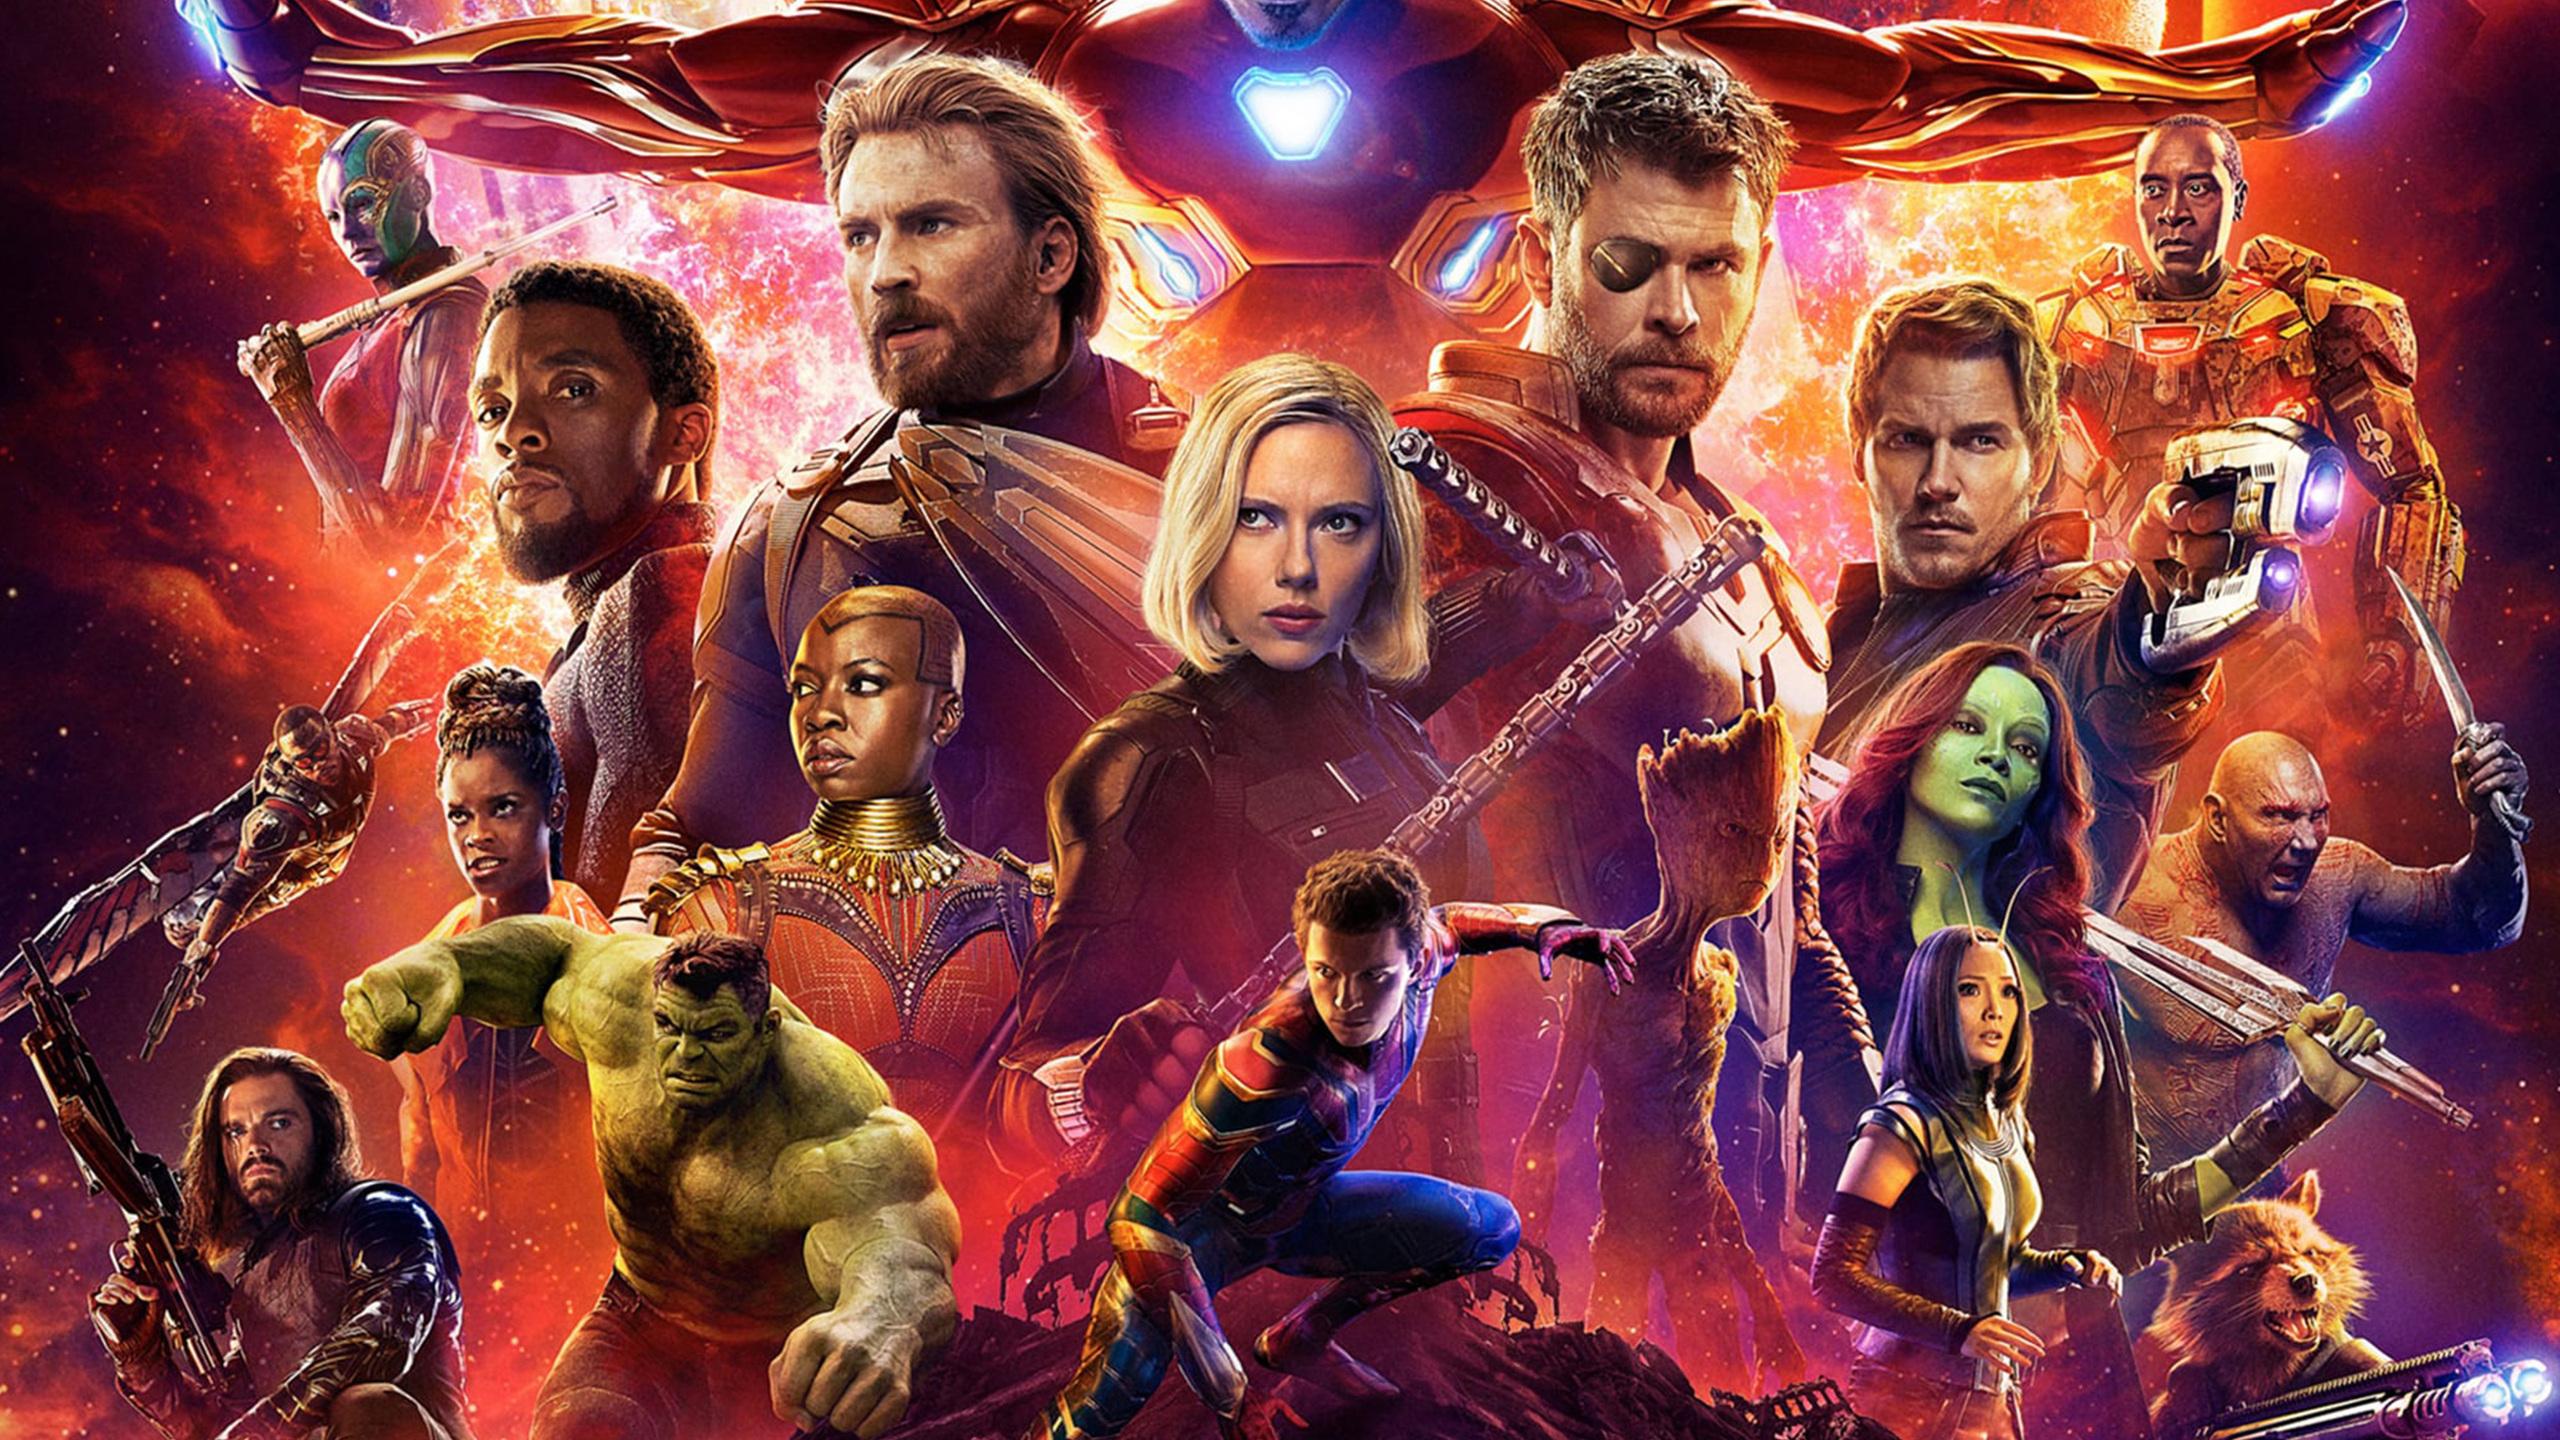 2560x1440 Avengers Infinity War 2018 Poster 4k 1440P ...